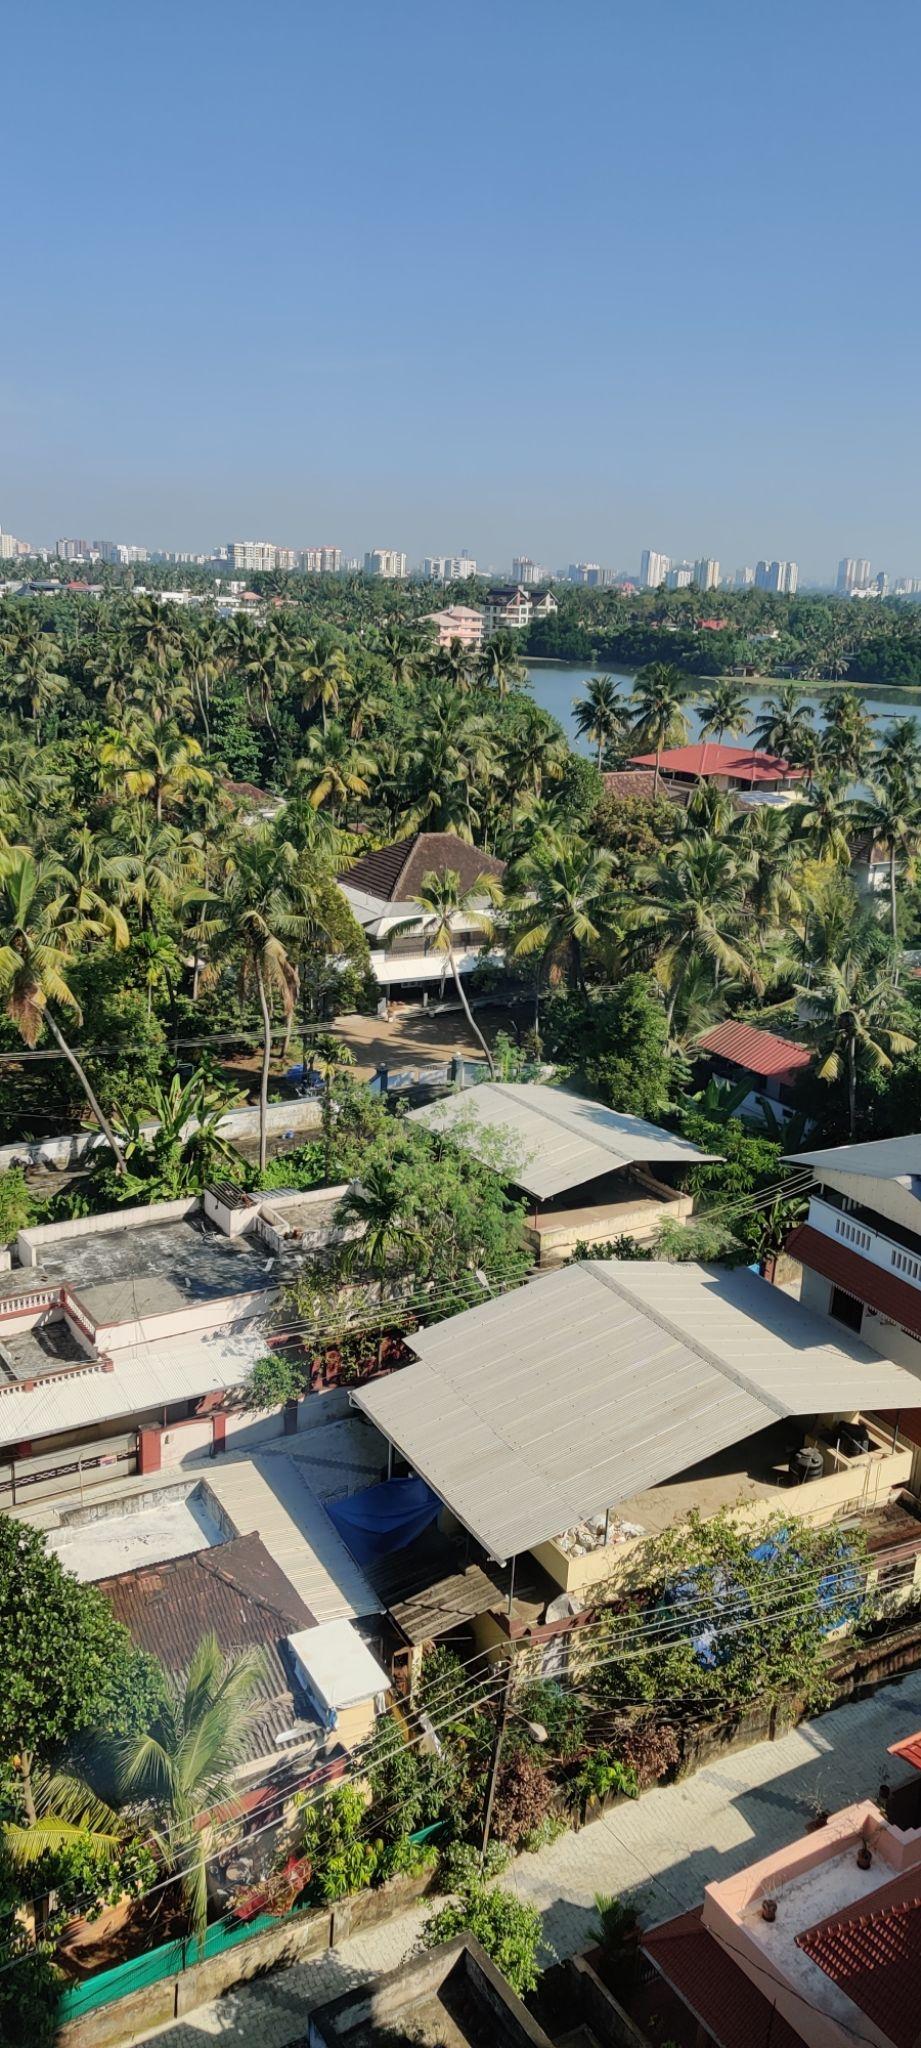 Photo of Kerala By yashvi thaker